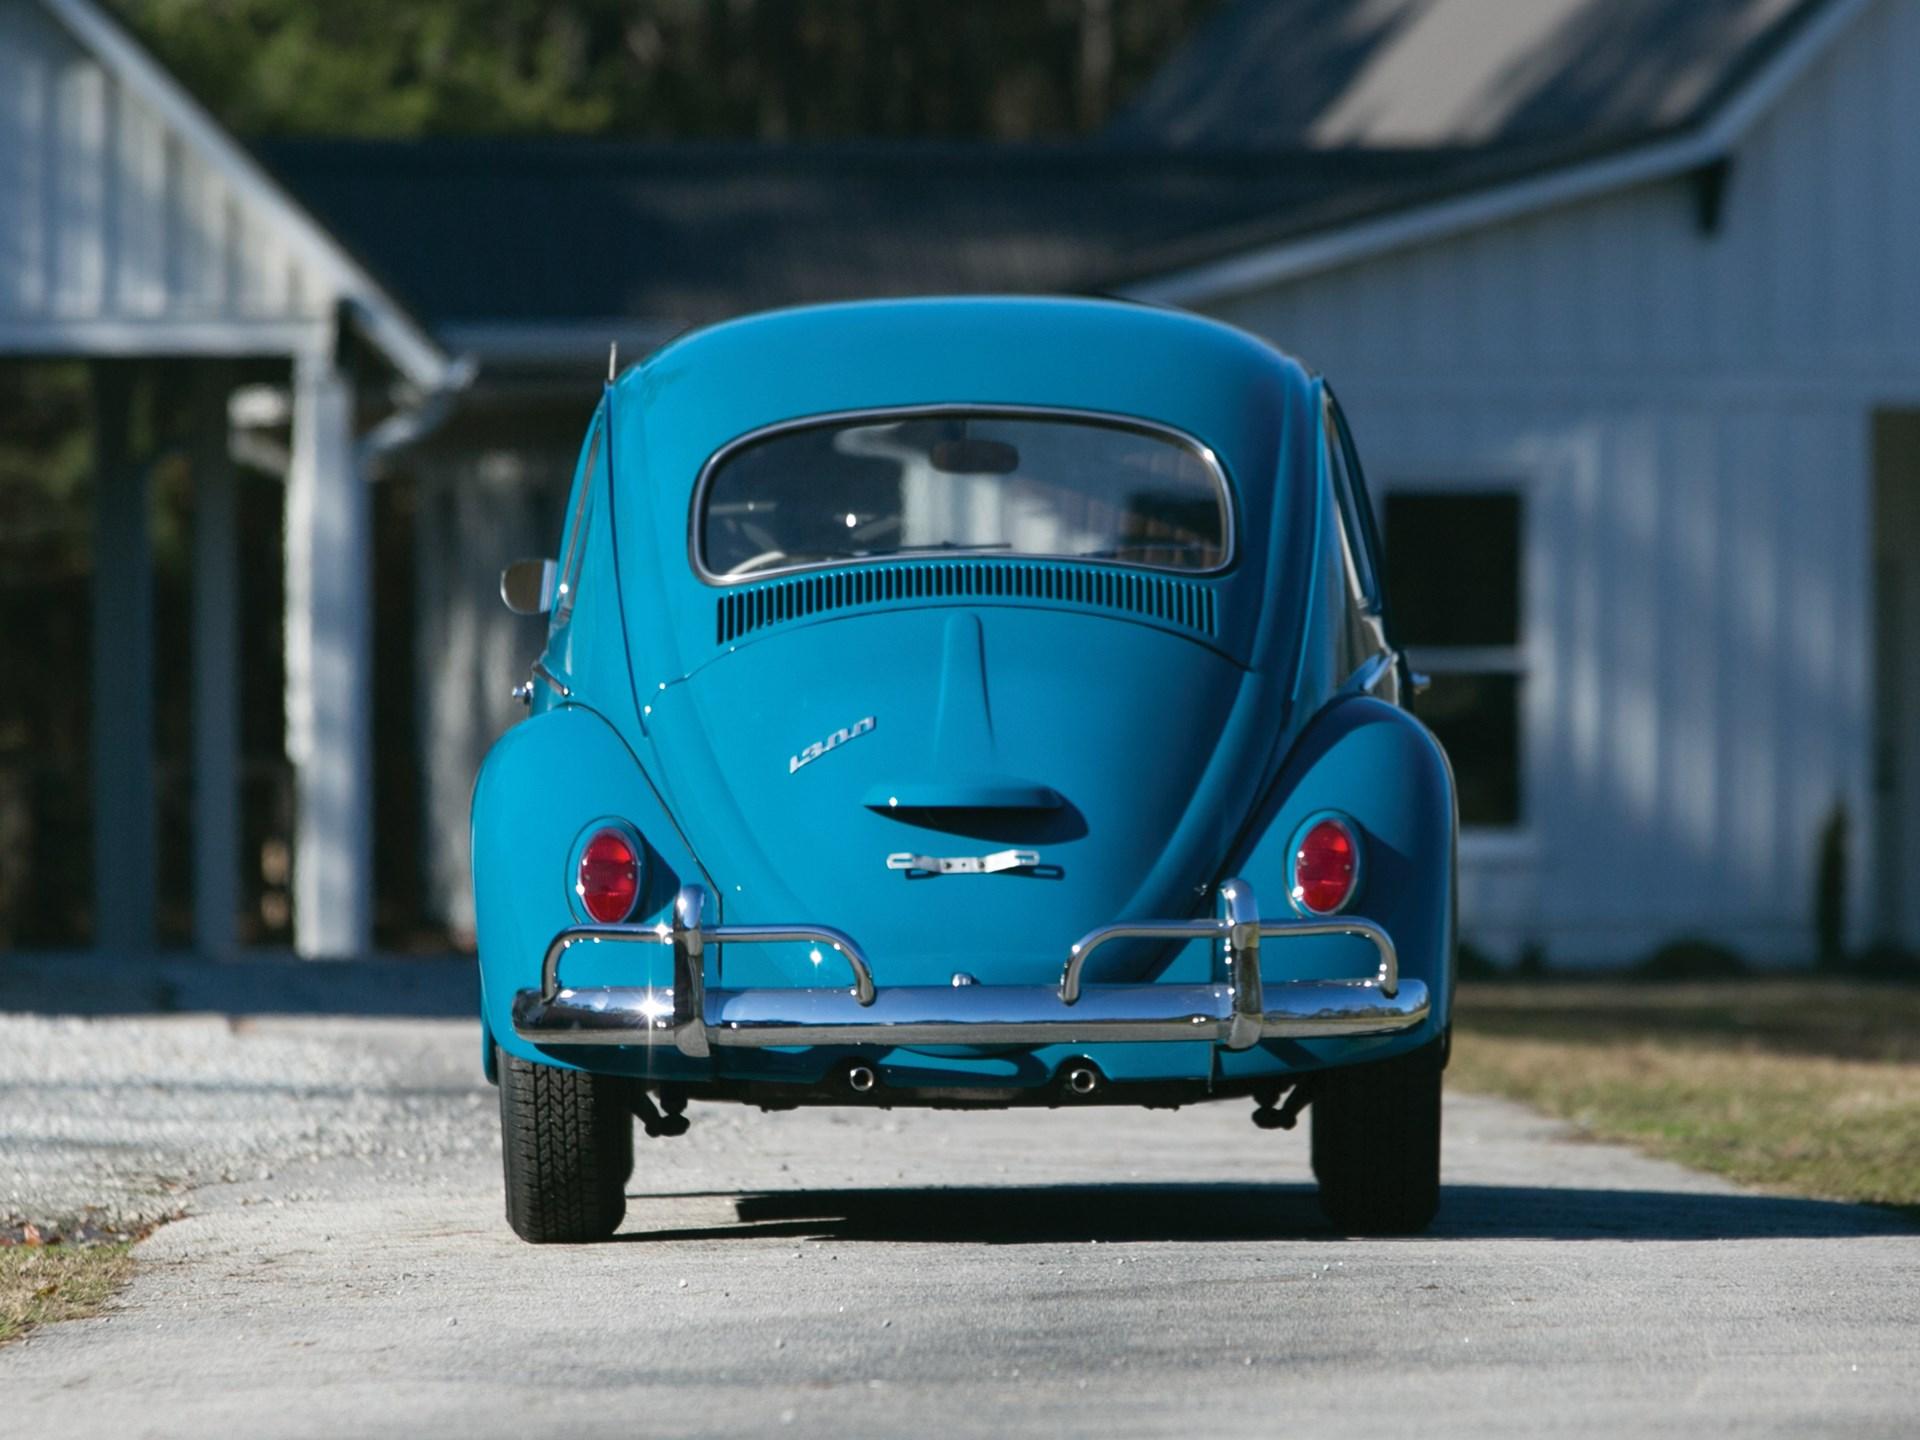 RM Sotheby's - 1964 Volkswagen Beetle 'Sunroof' Sedan